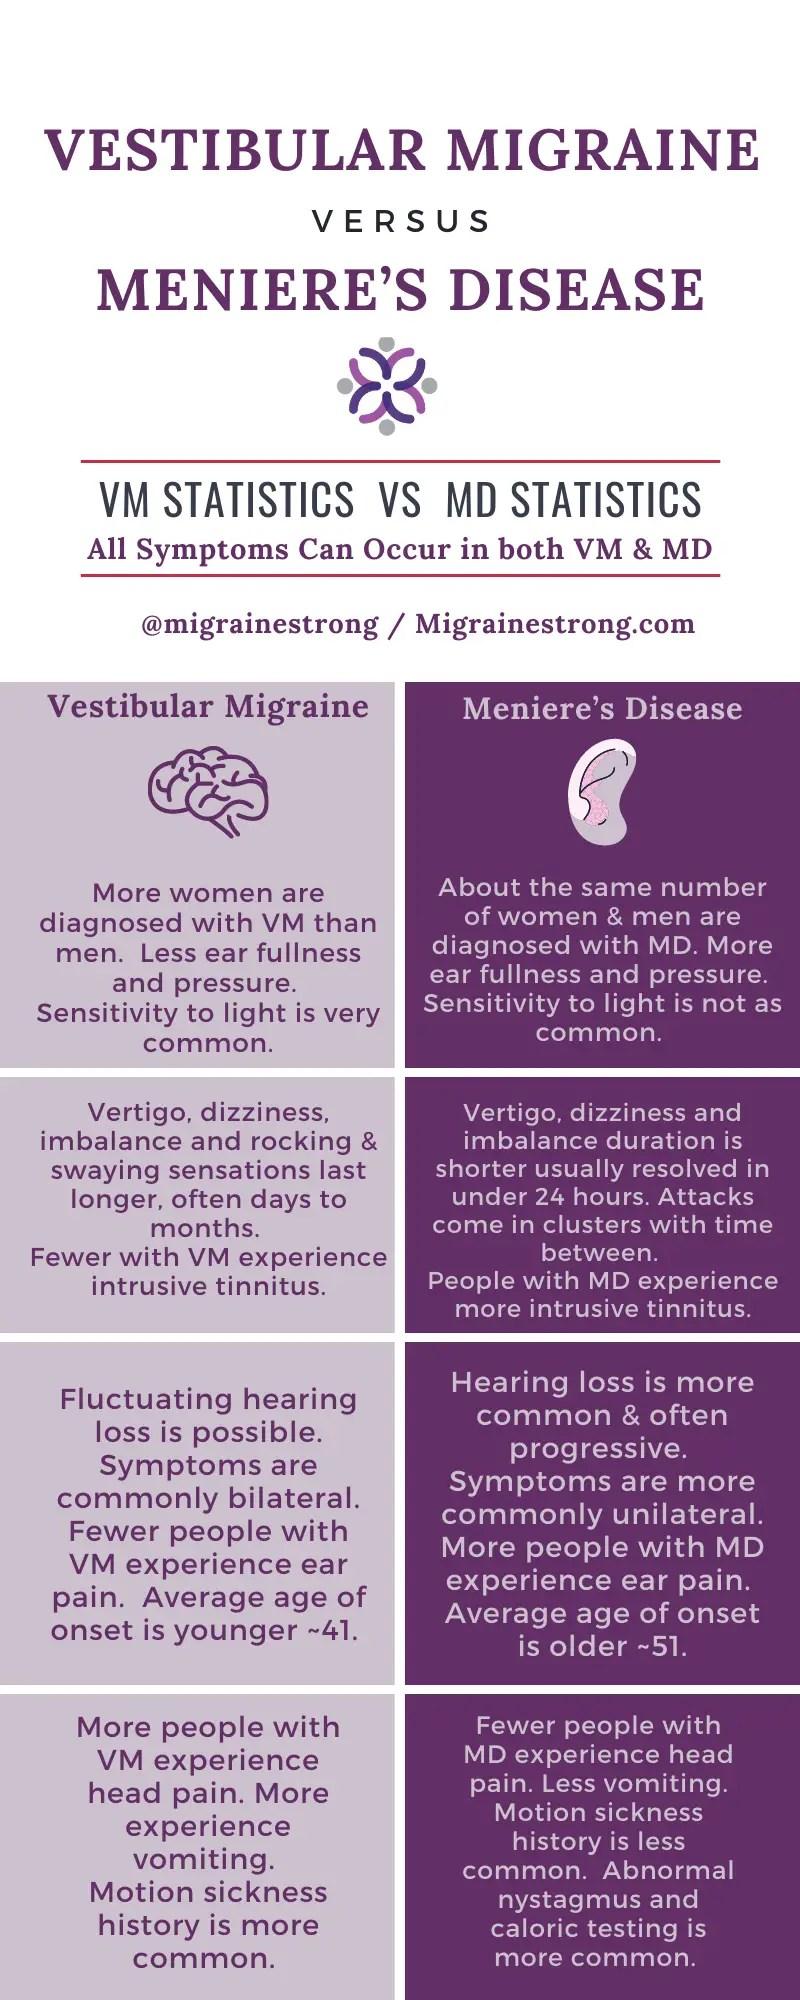 Vestibular migraine and meniere's disease